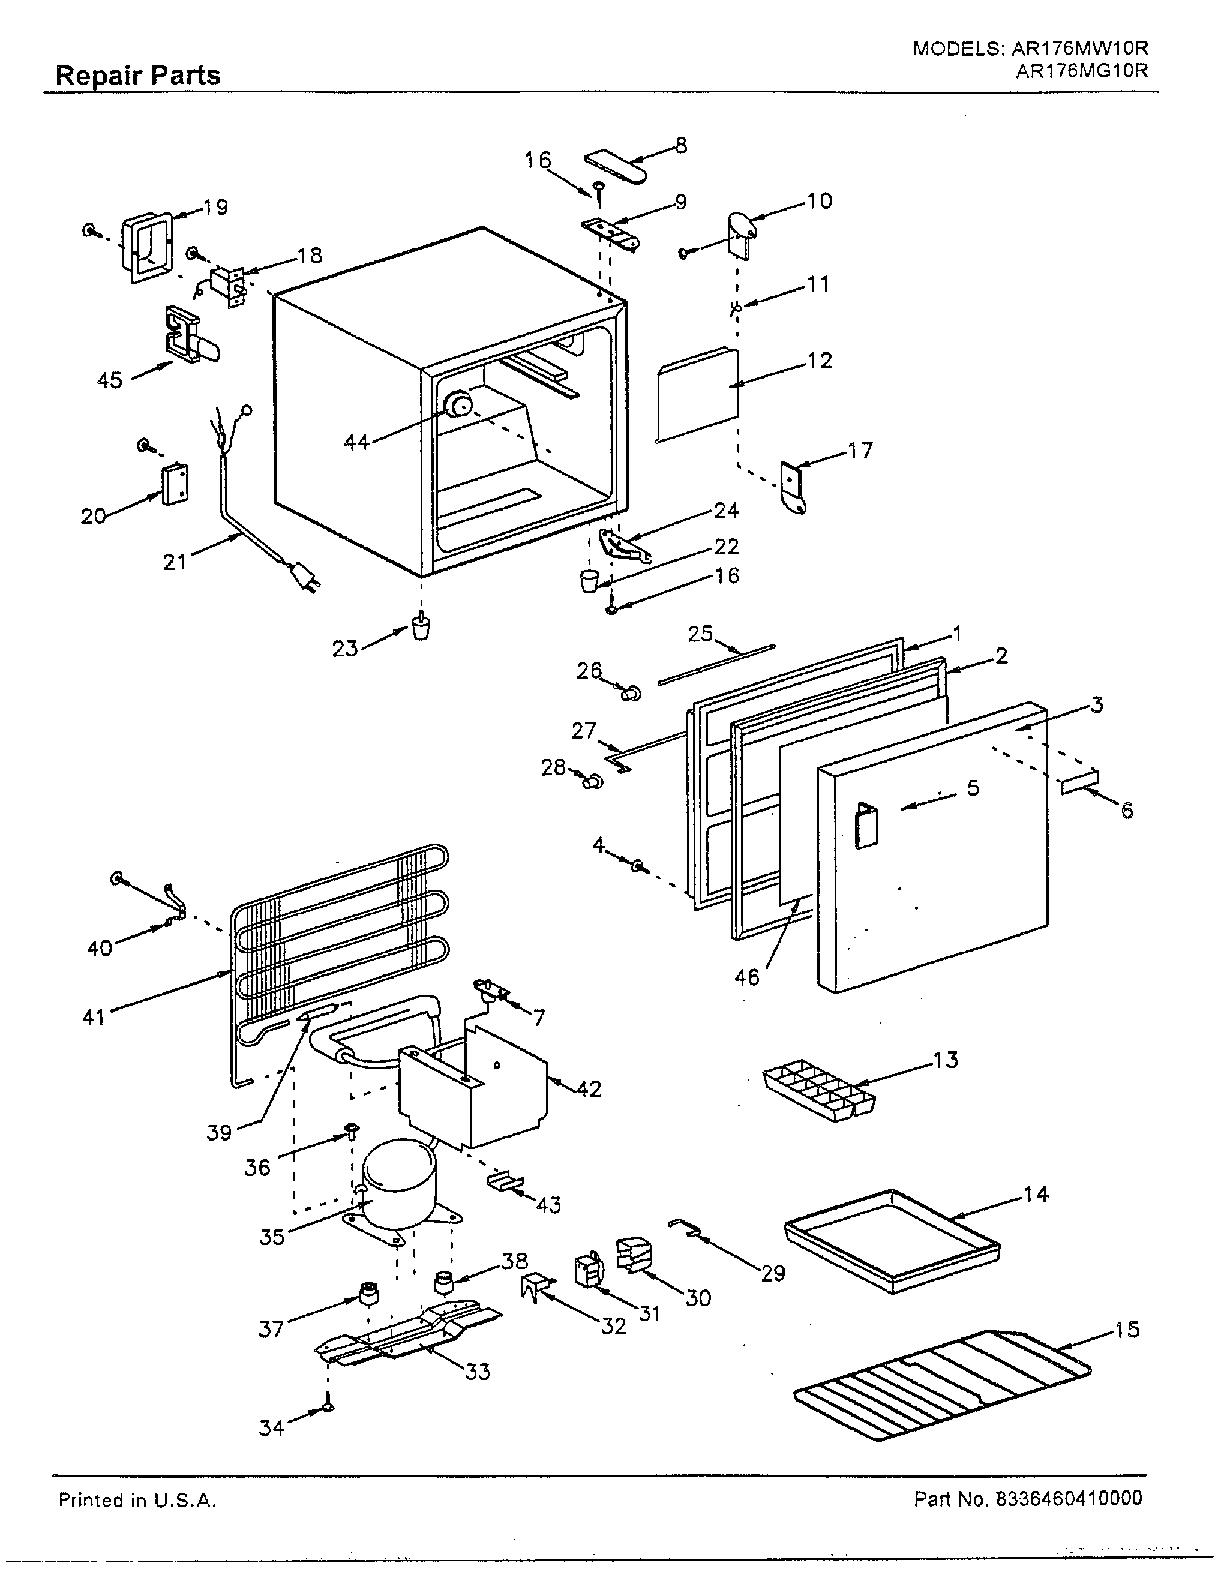 Sanyo model AR176MW10R under counter refrigerator genuine